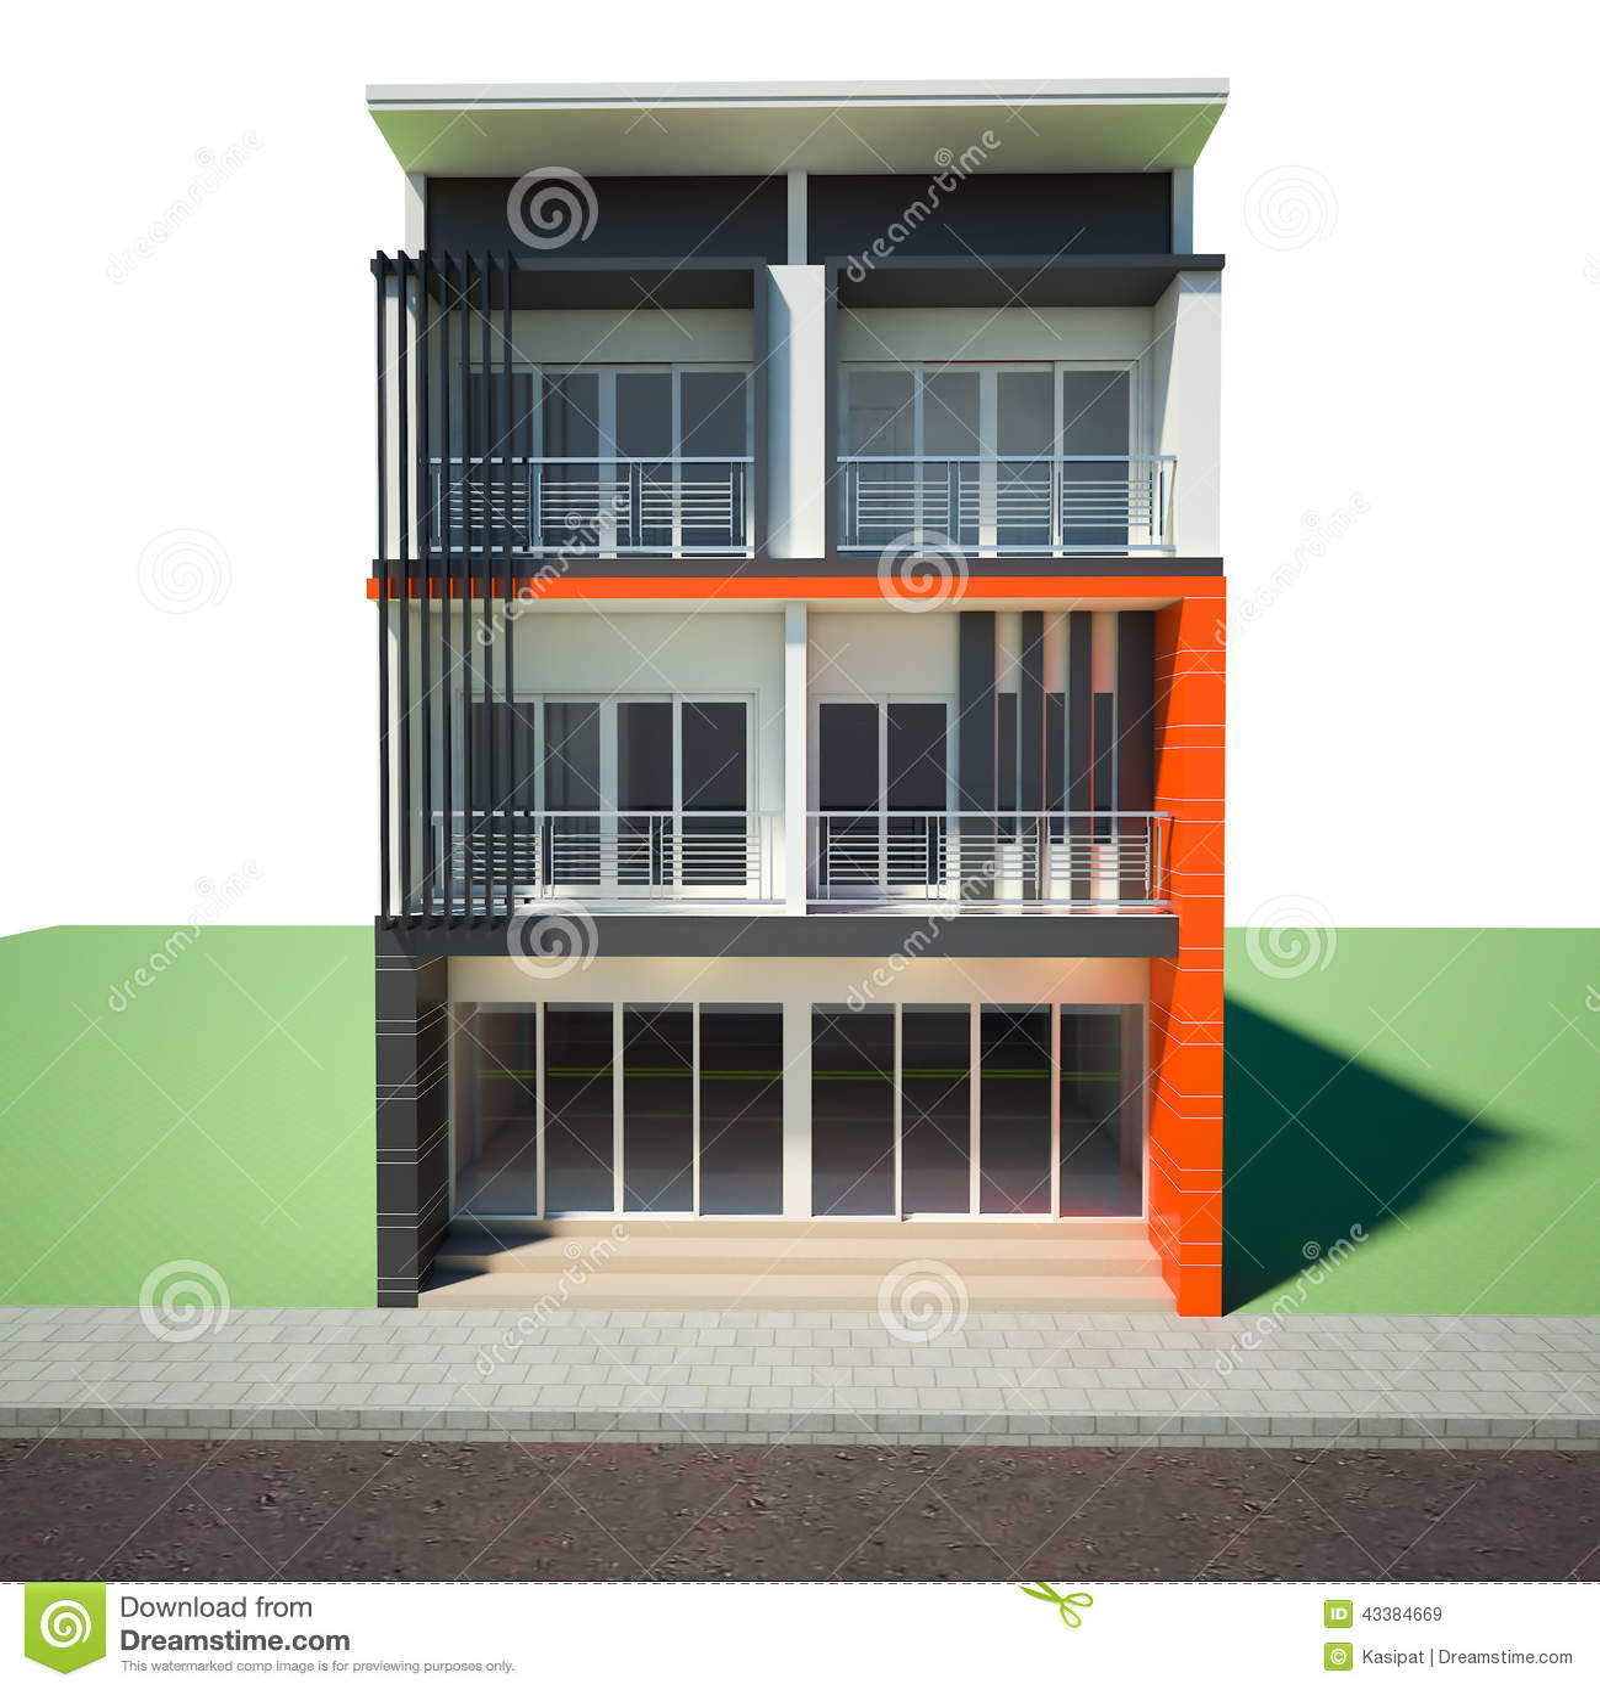 Royalty Free Illustration. Download Building 3rd Floor ...